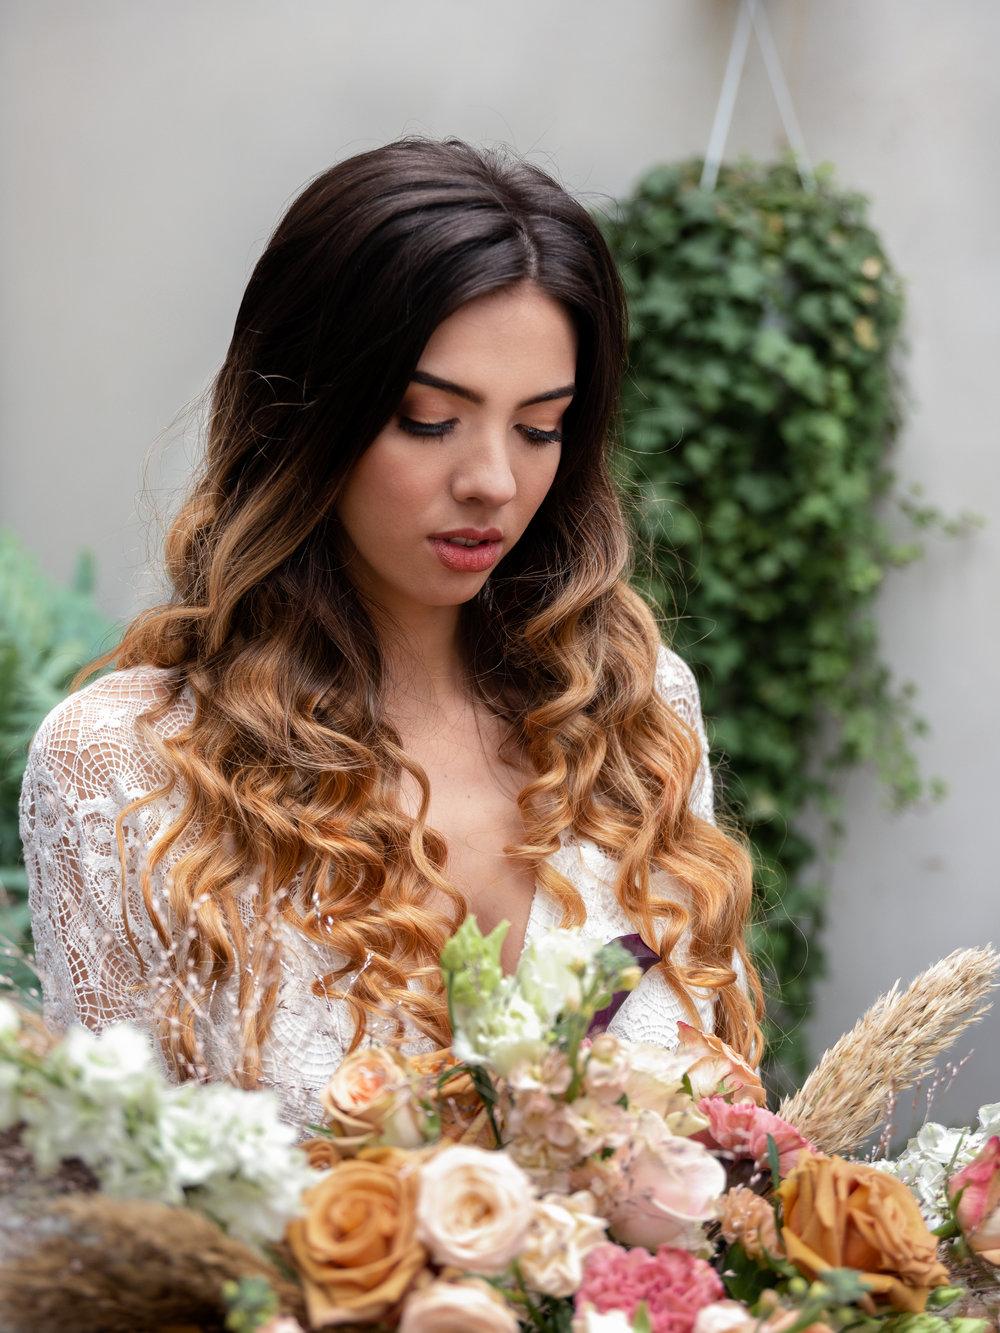 styled-bridal-6.jpg